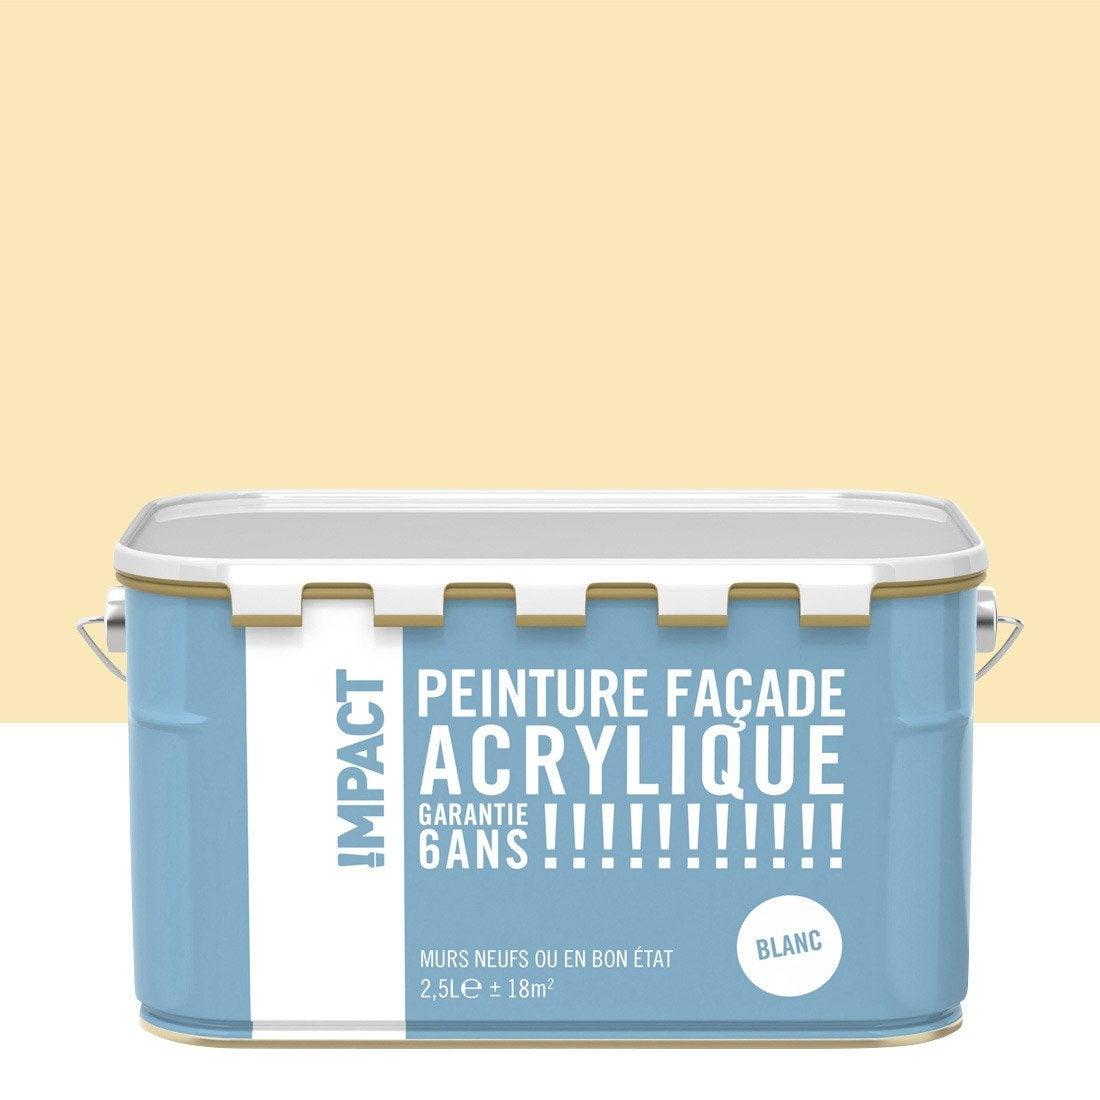 Peinture fa ade acrylique impact ton pierre 2 5 l for Peinture acrylique leroy merlin